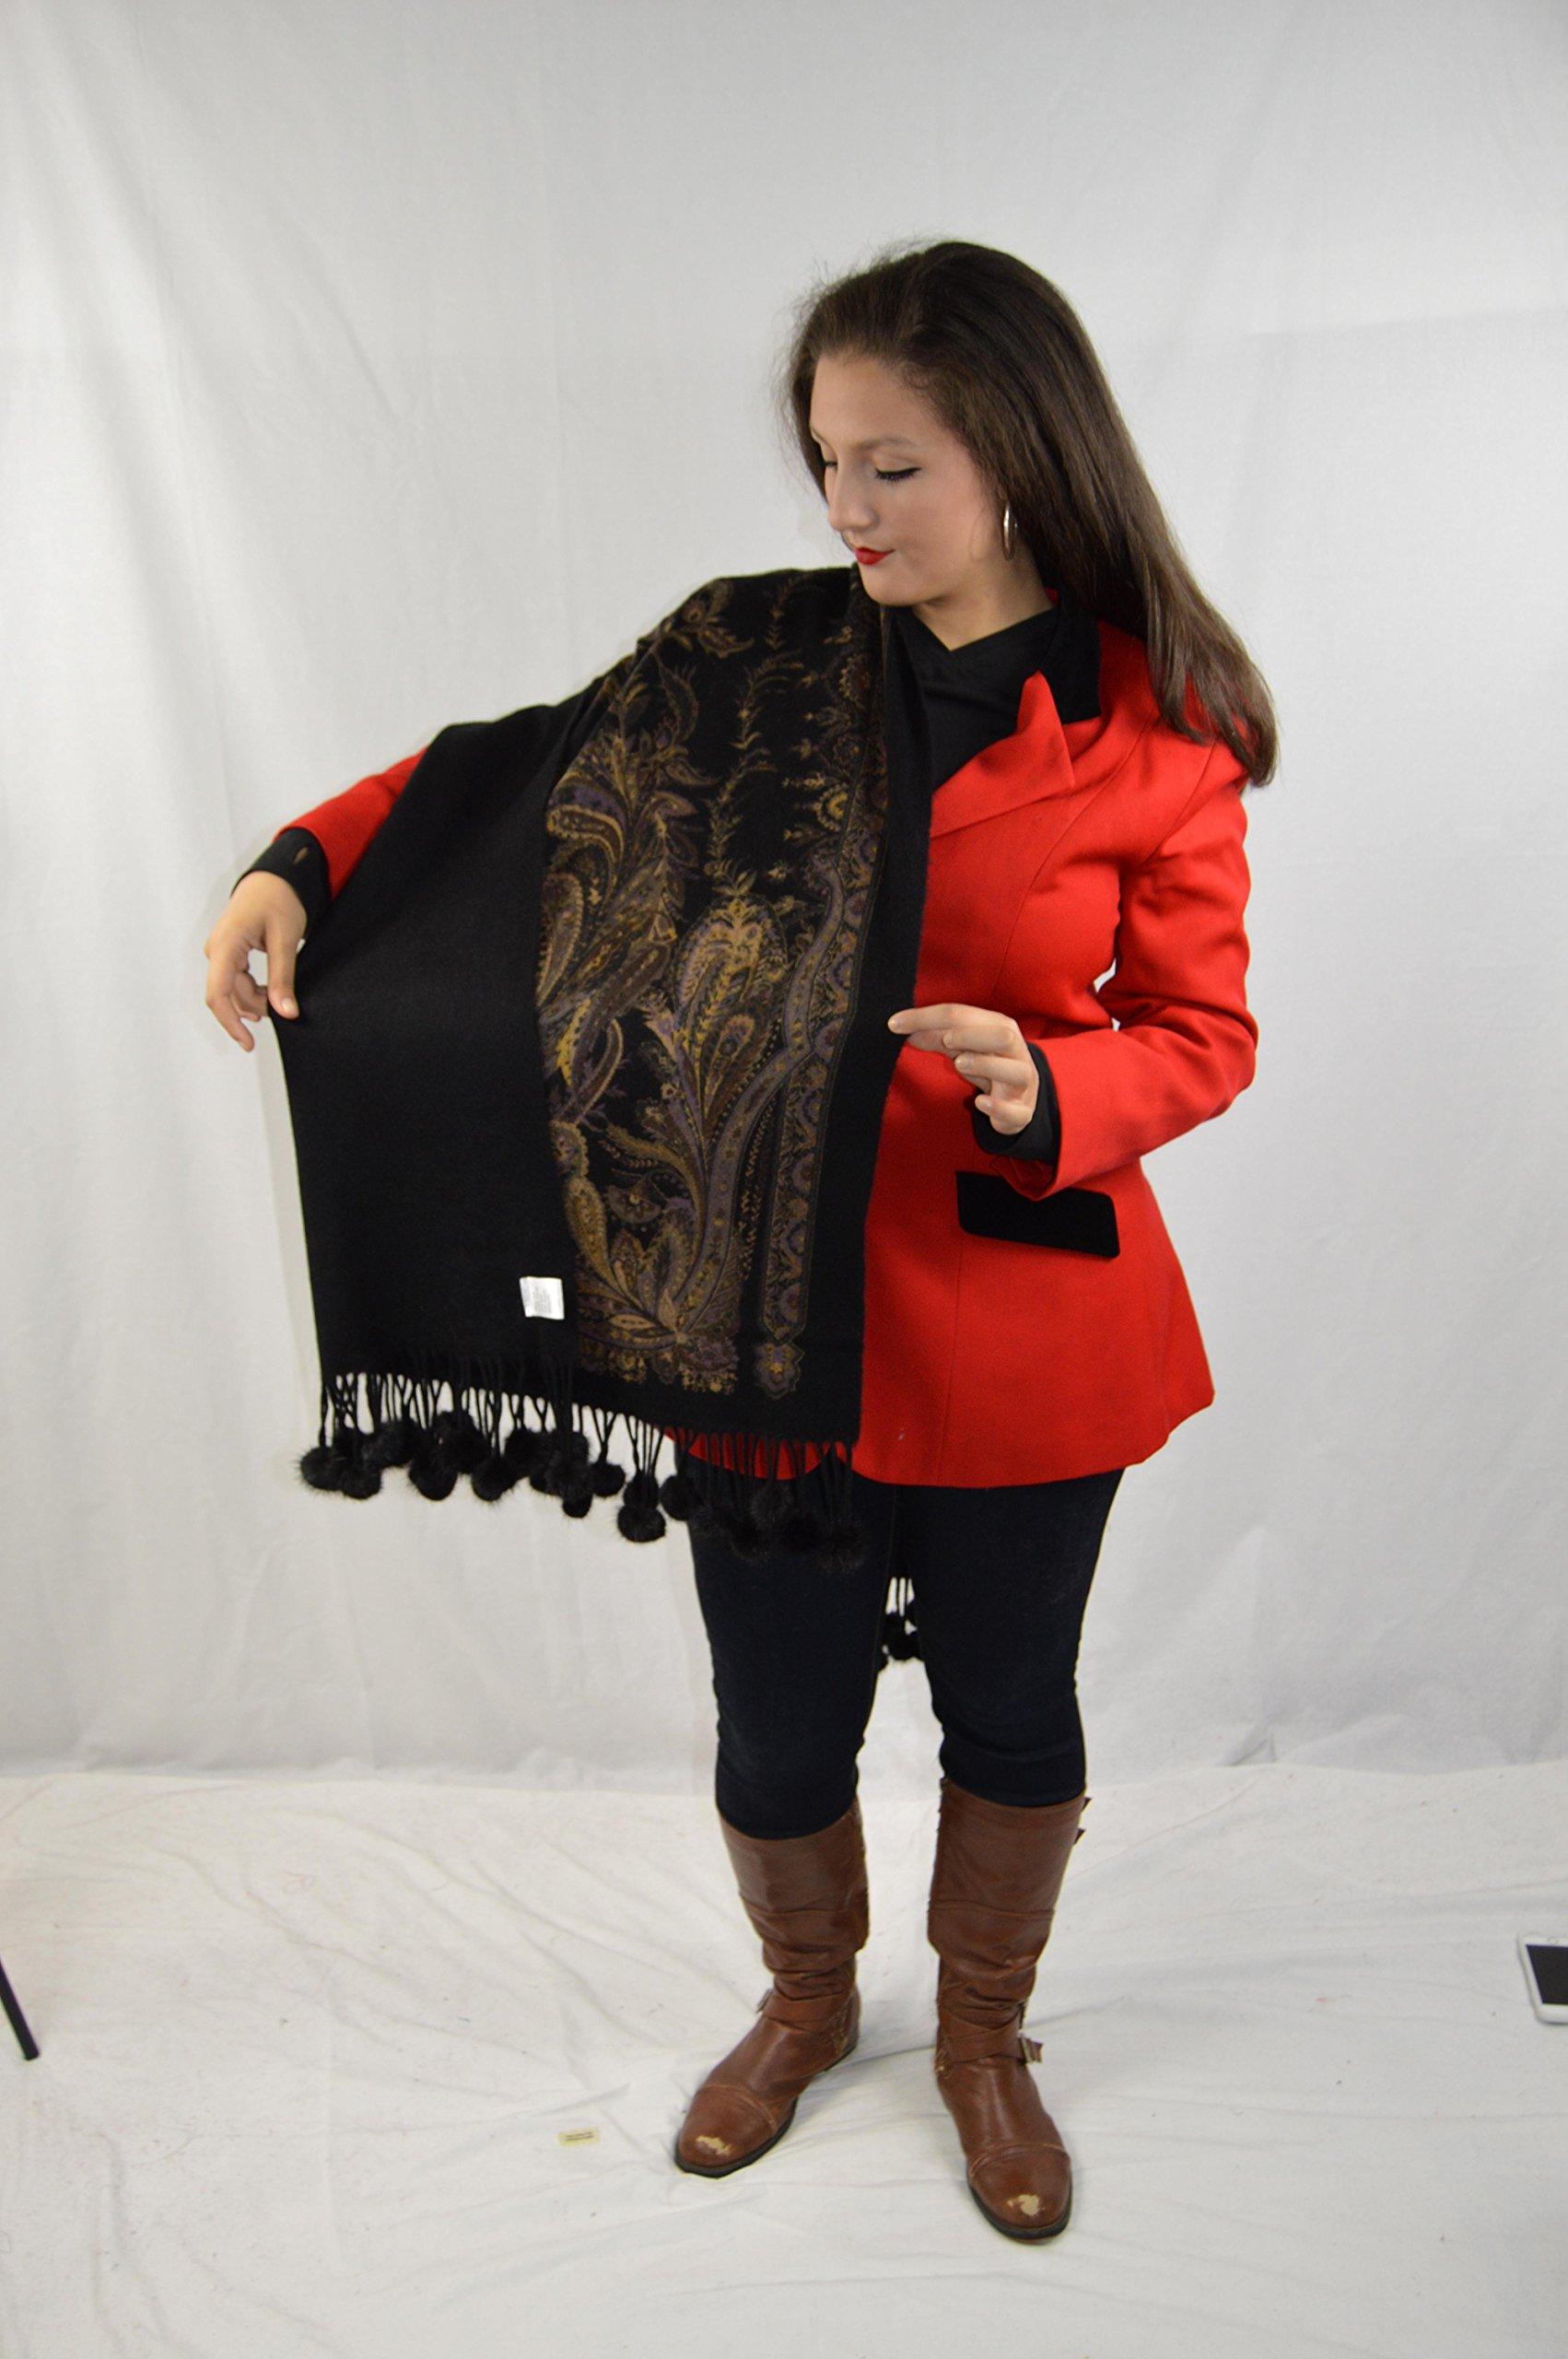 Cashmere Pashmina Group-Cashmere Shawl Scarf Wrap Stole (Solid/ Reversible Print w/ Genuine Fur) - Mink Black by Cashmere Pashmina Group (Image #5)